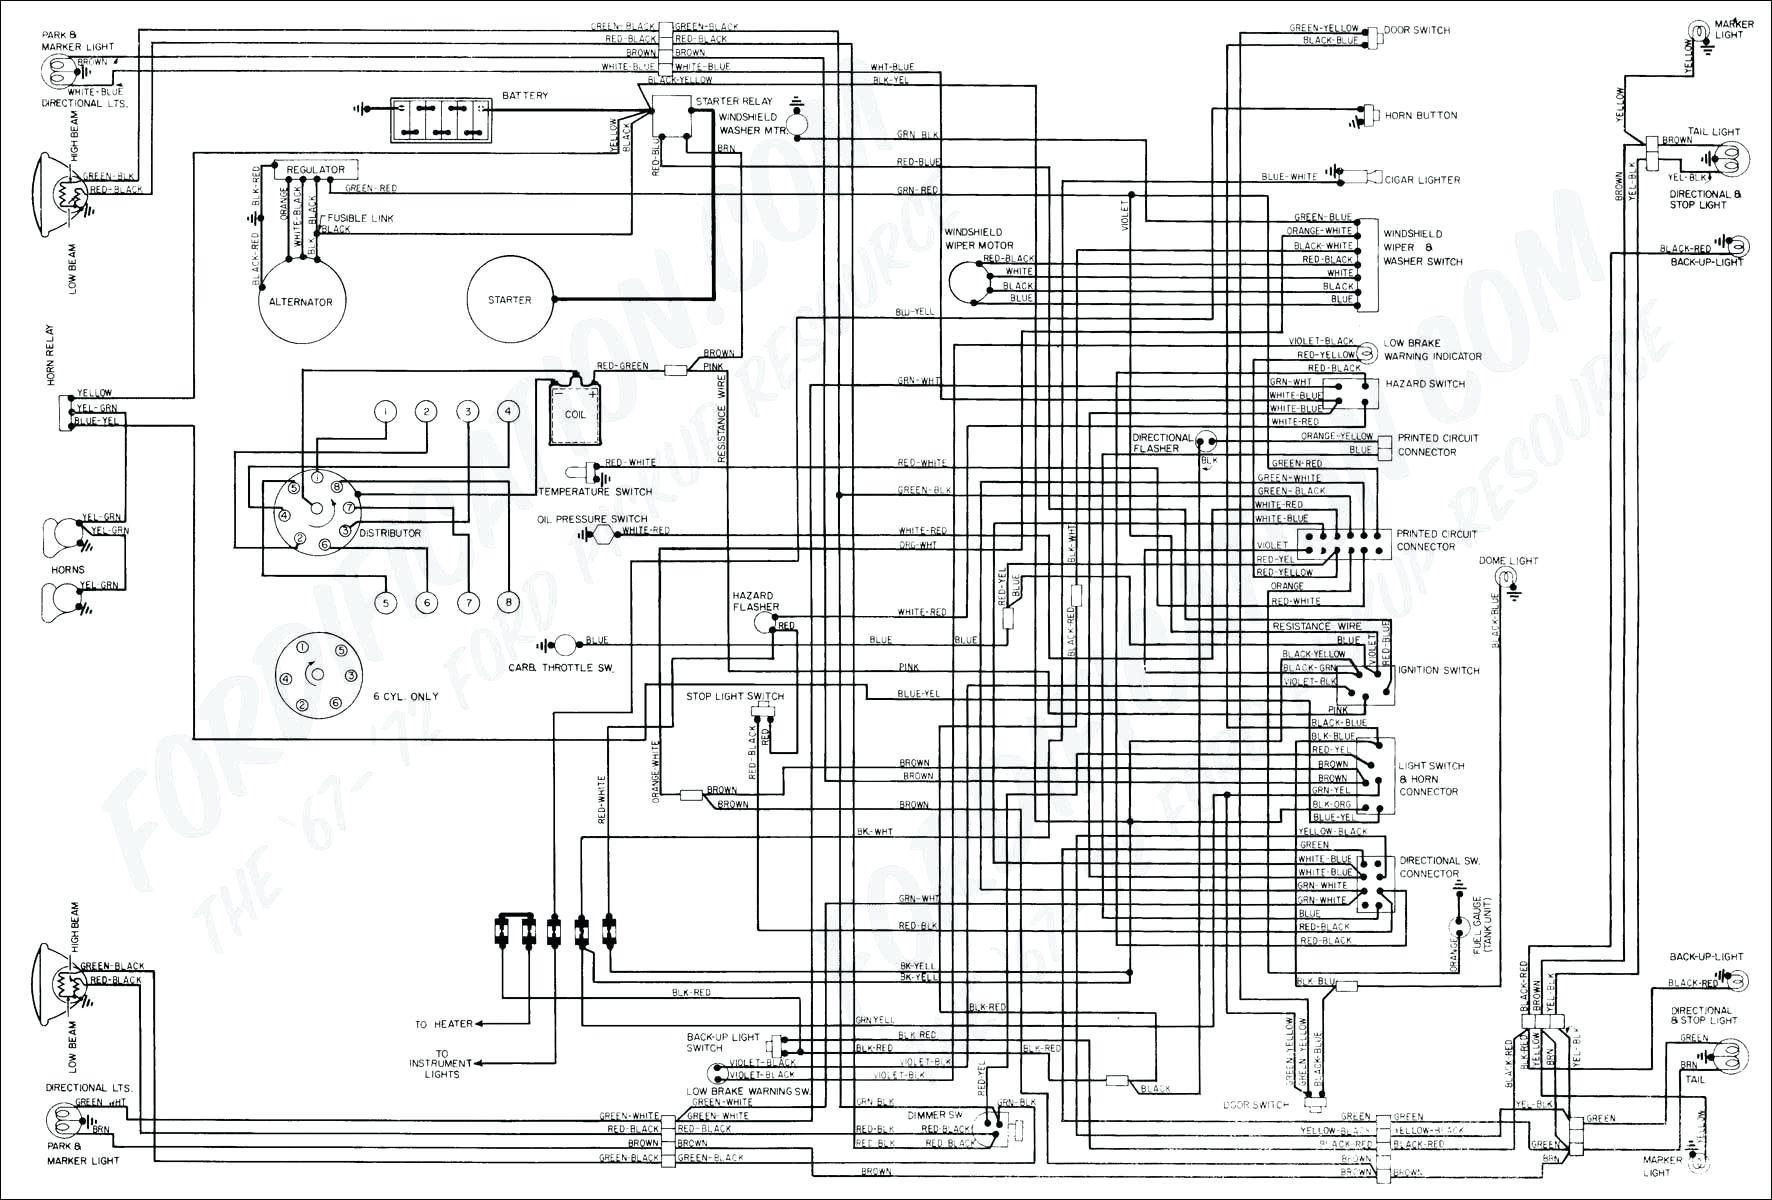 Stx 38 Wiring Diagram Color Schemes John Deere Electrical Schematic Diagrams Gator Stx38